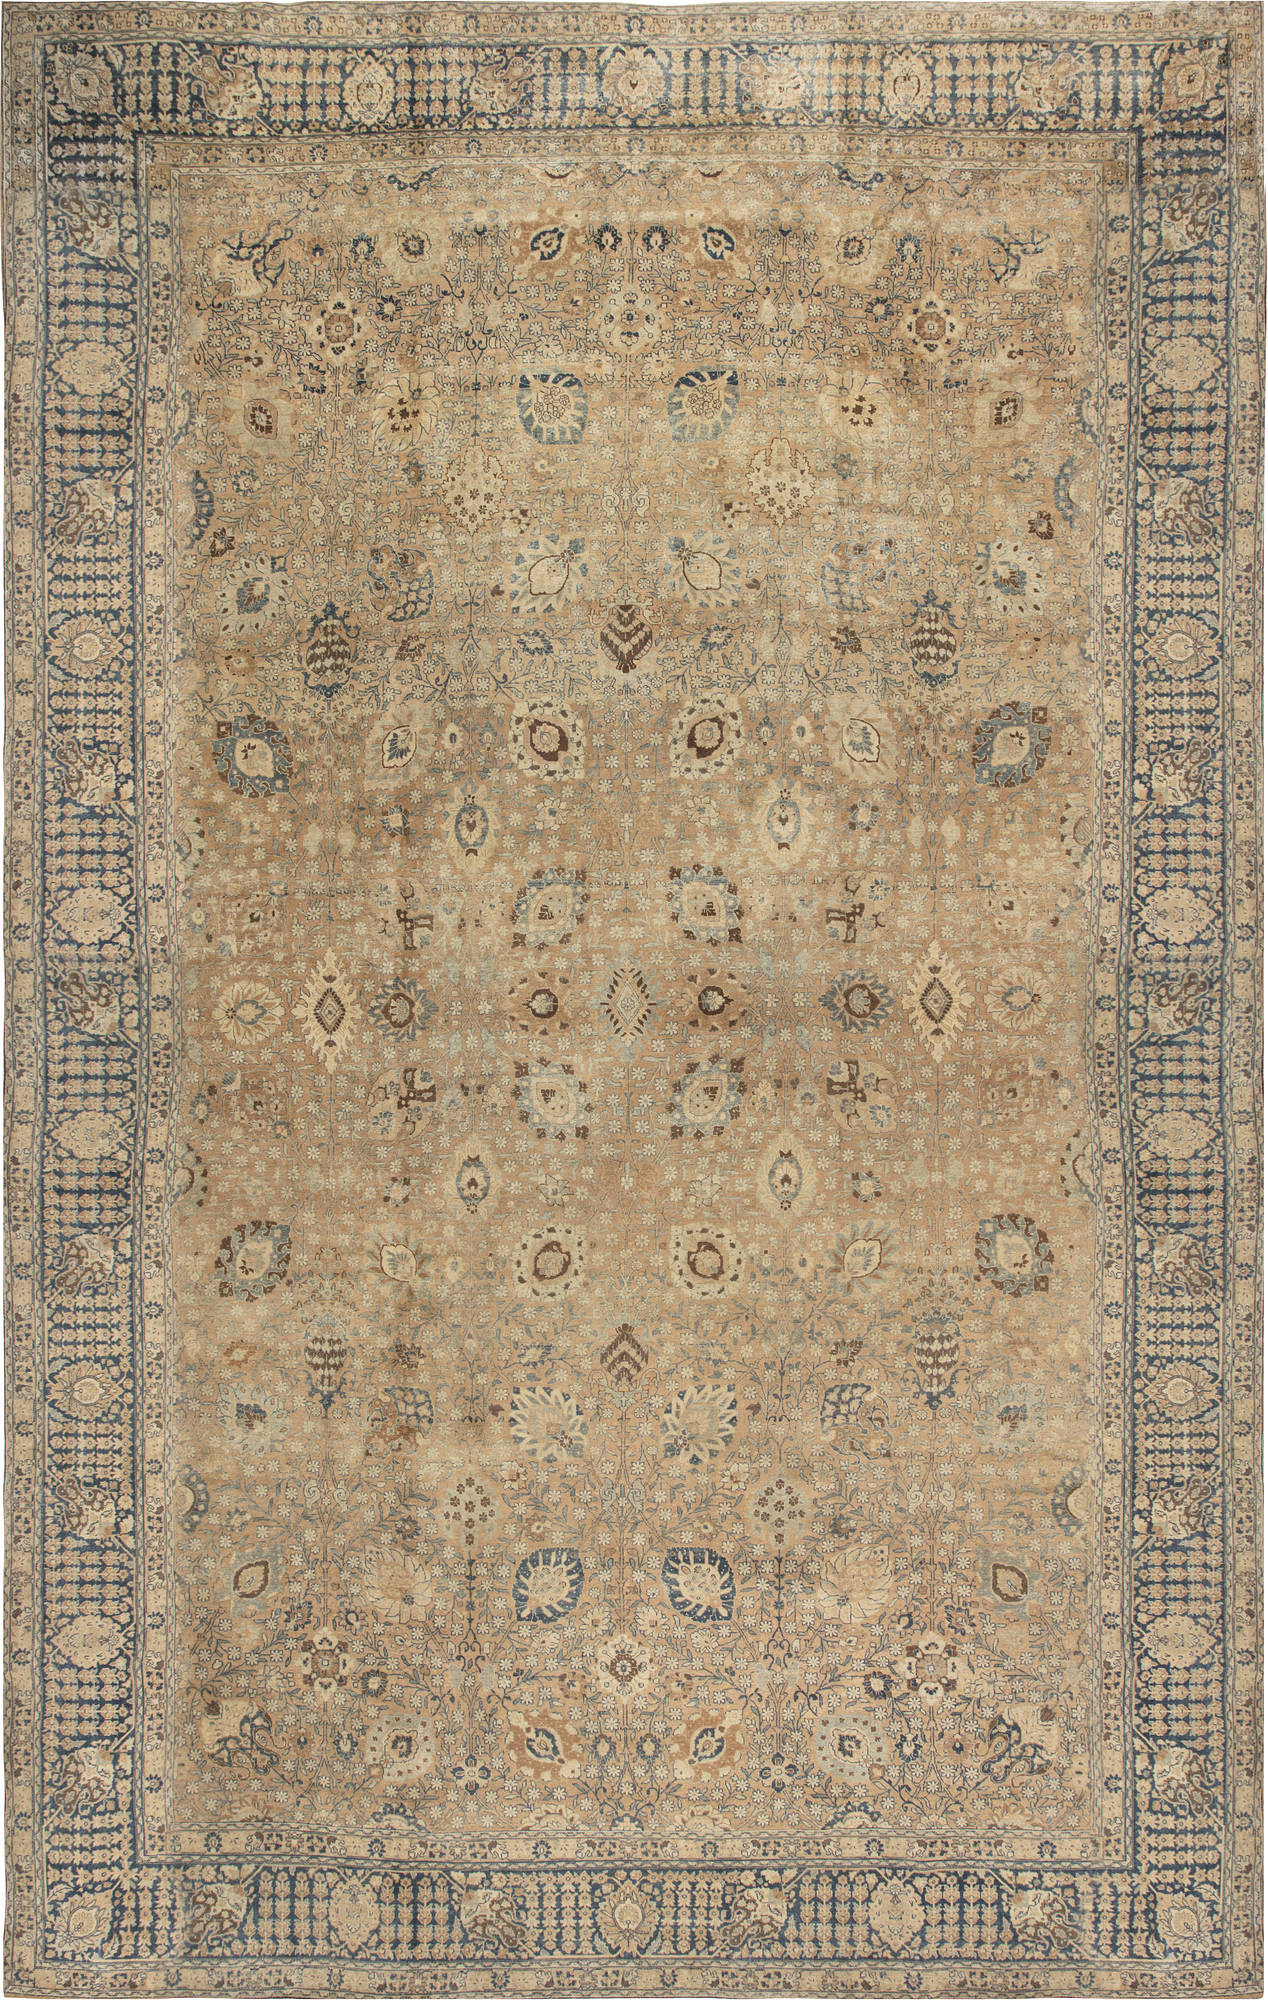 Antique Persian Tabriz Carpet BB6735